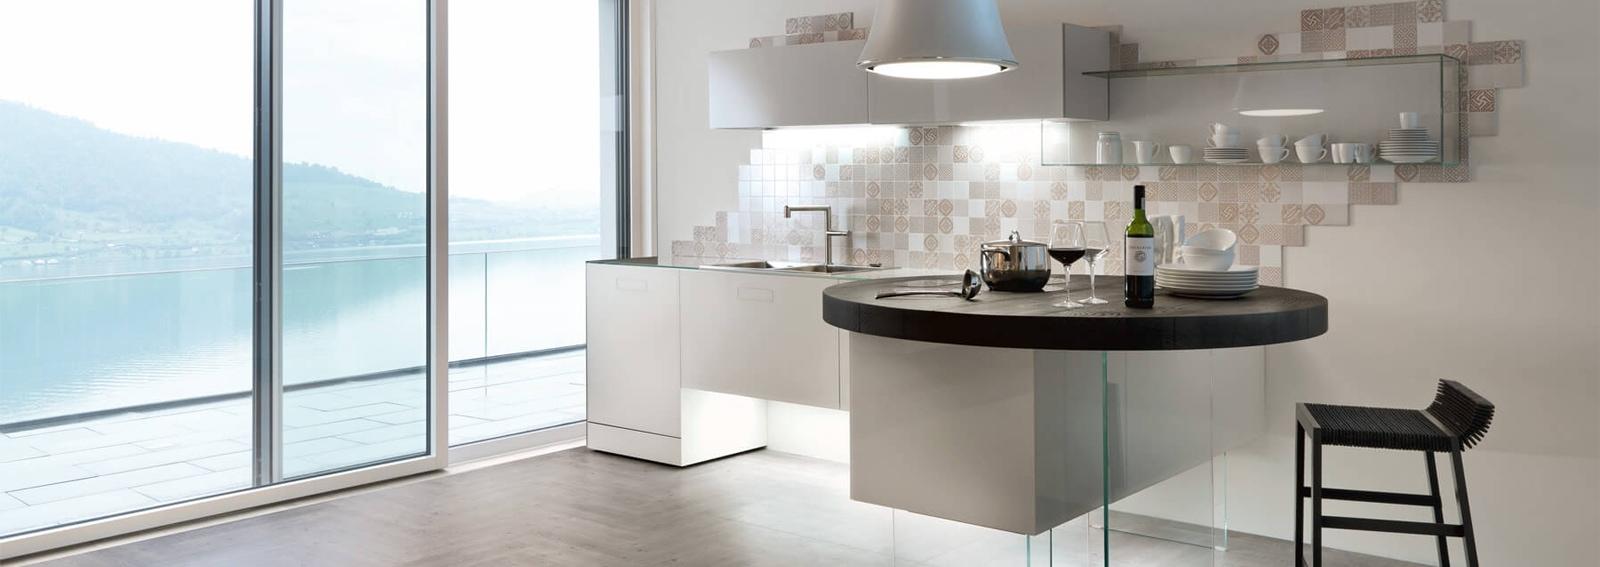 cover-desktop-cucine-penisola-case-piccole